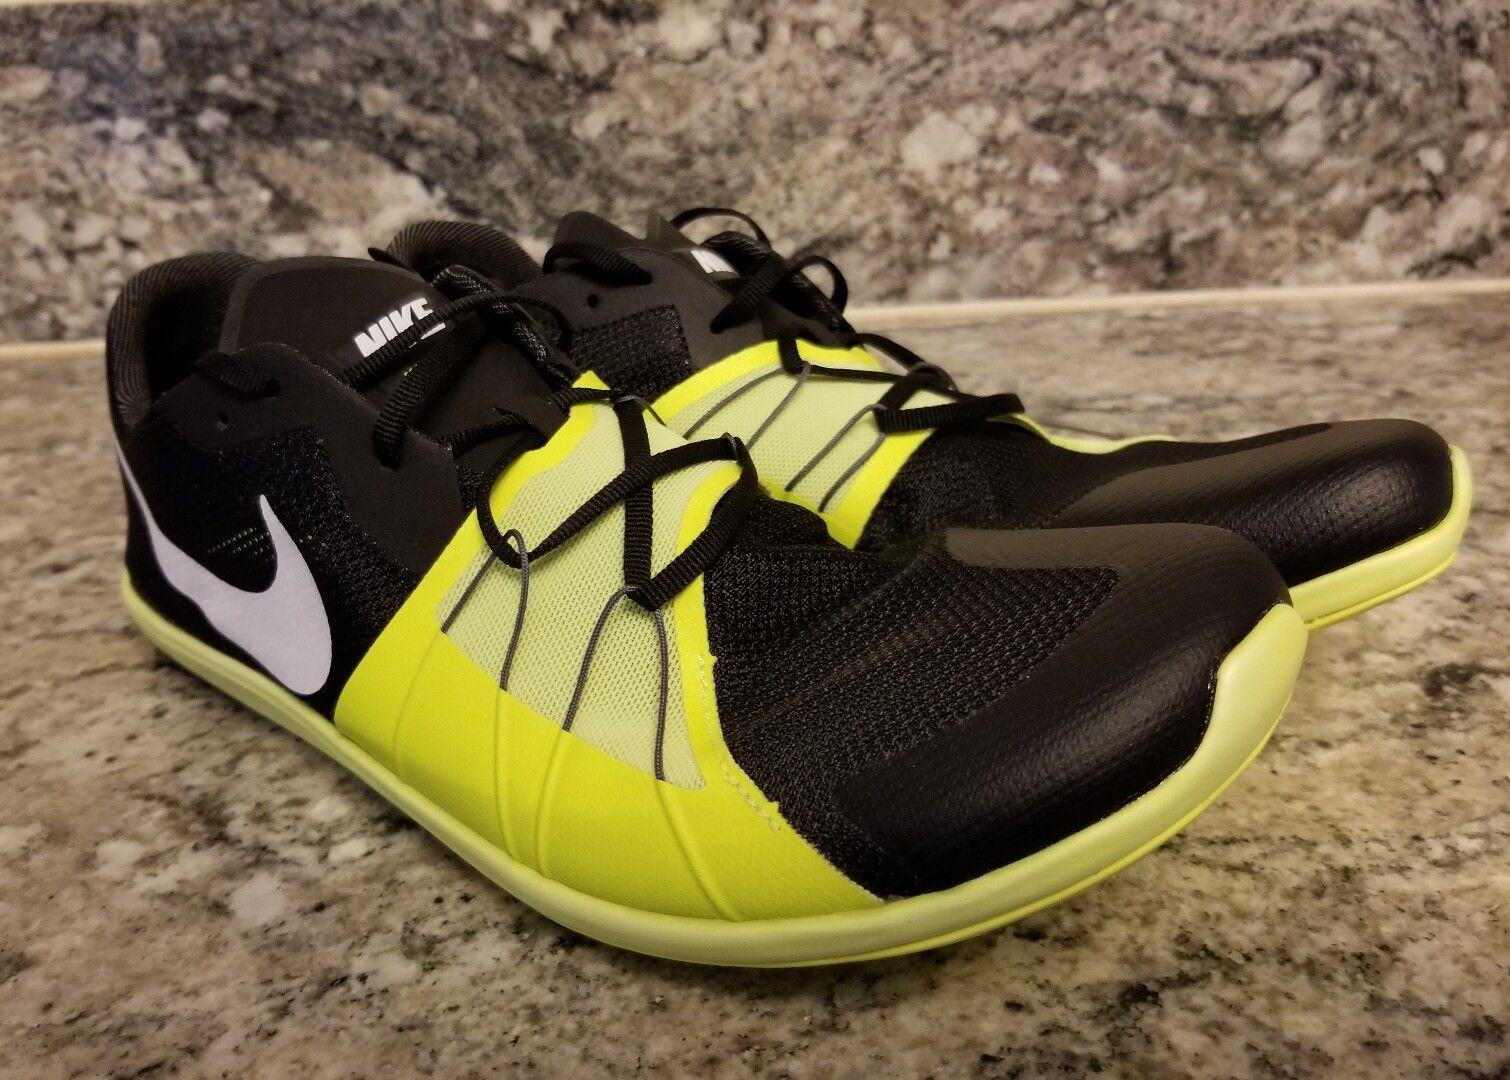 Nike Zoom para siempre XC 5 / Spike SZ 11m 904723 017 Negro / 5 Volt Victoria XC barato y hermoso moda 7ffc91